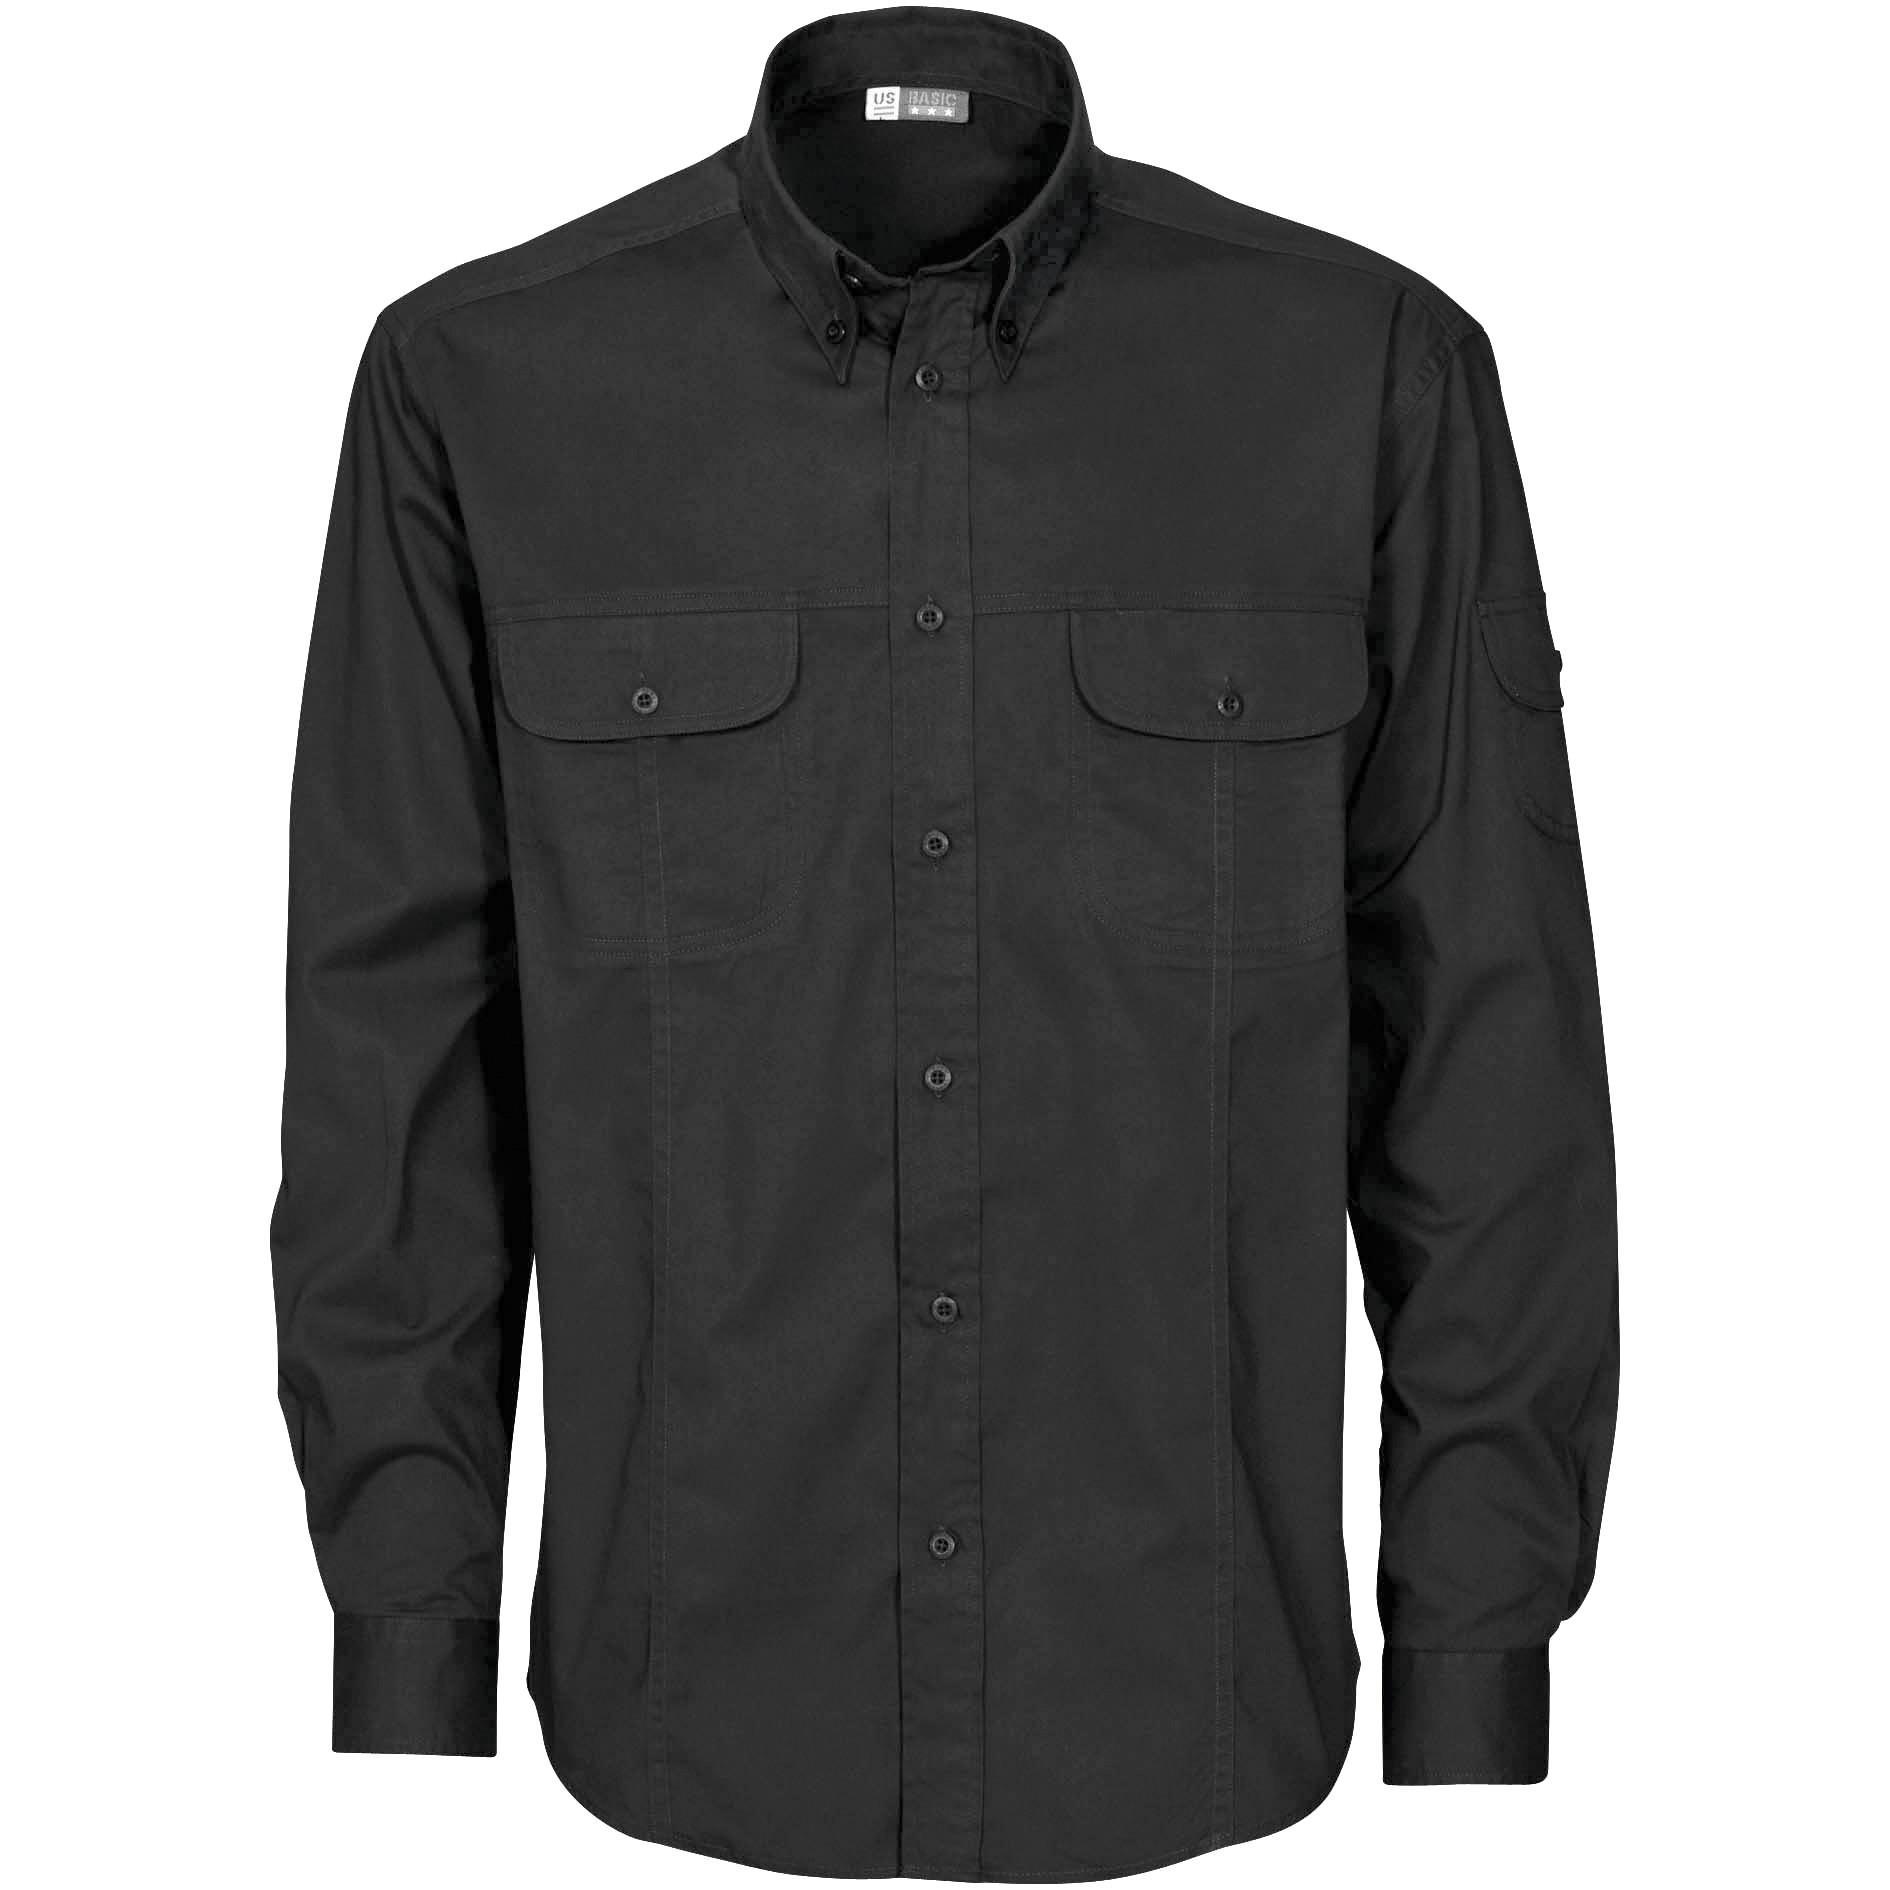 Mens Long Sleeve Phoenix Shirt - Black Only